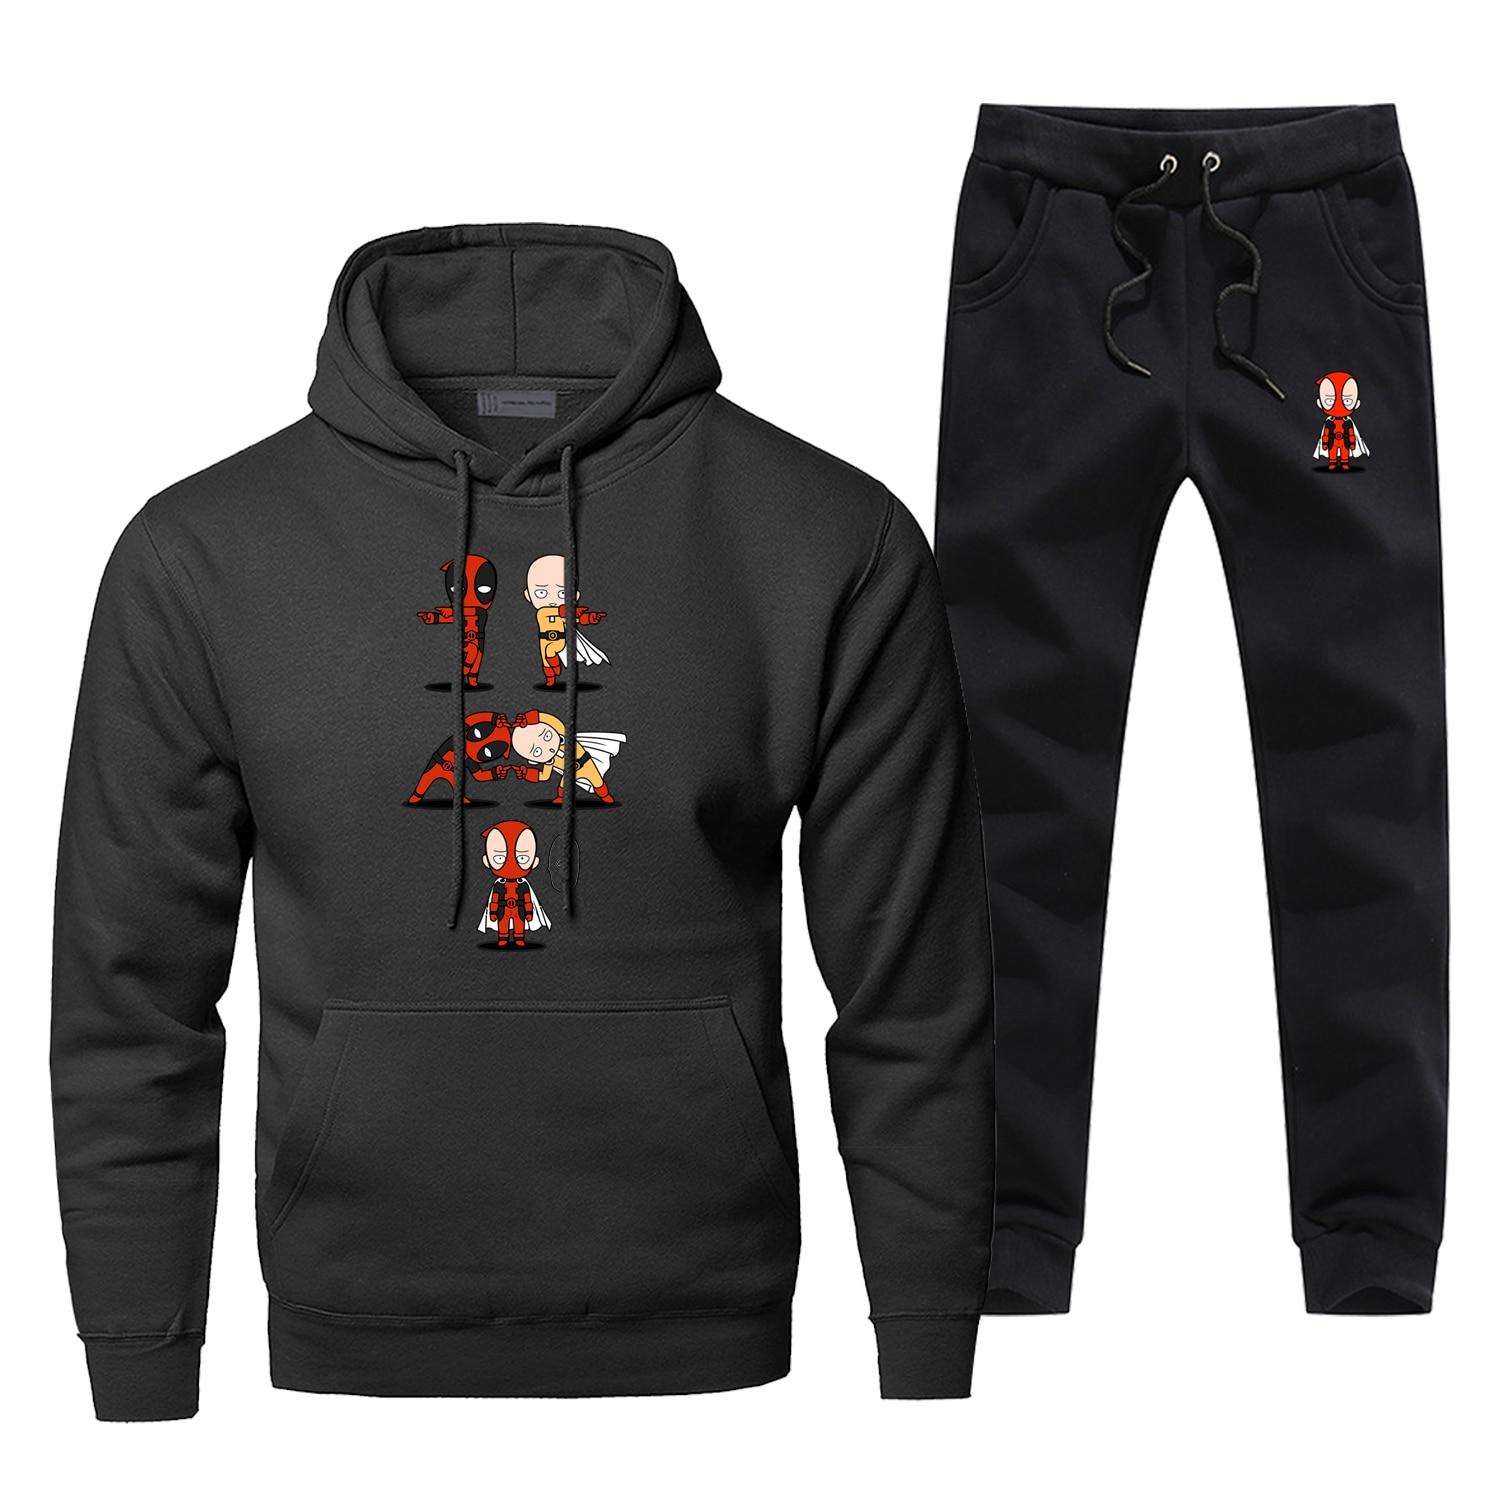 Funny Marvel Super Hero Deadpool One Punch-Man Fusion Hoodies Two Piece Pants Men Fleece Sweatshirt Streetwear Sweatpants